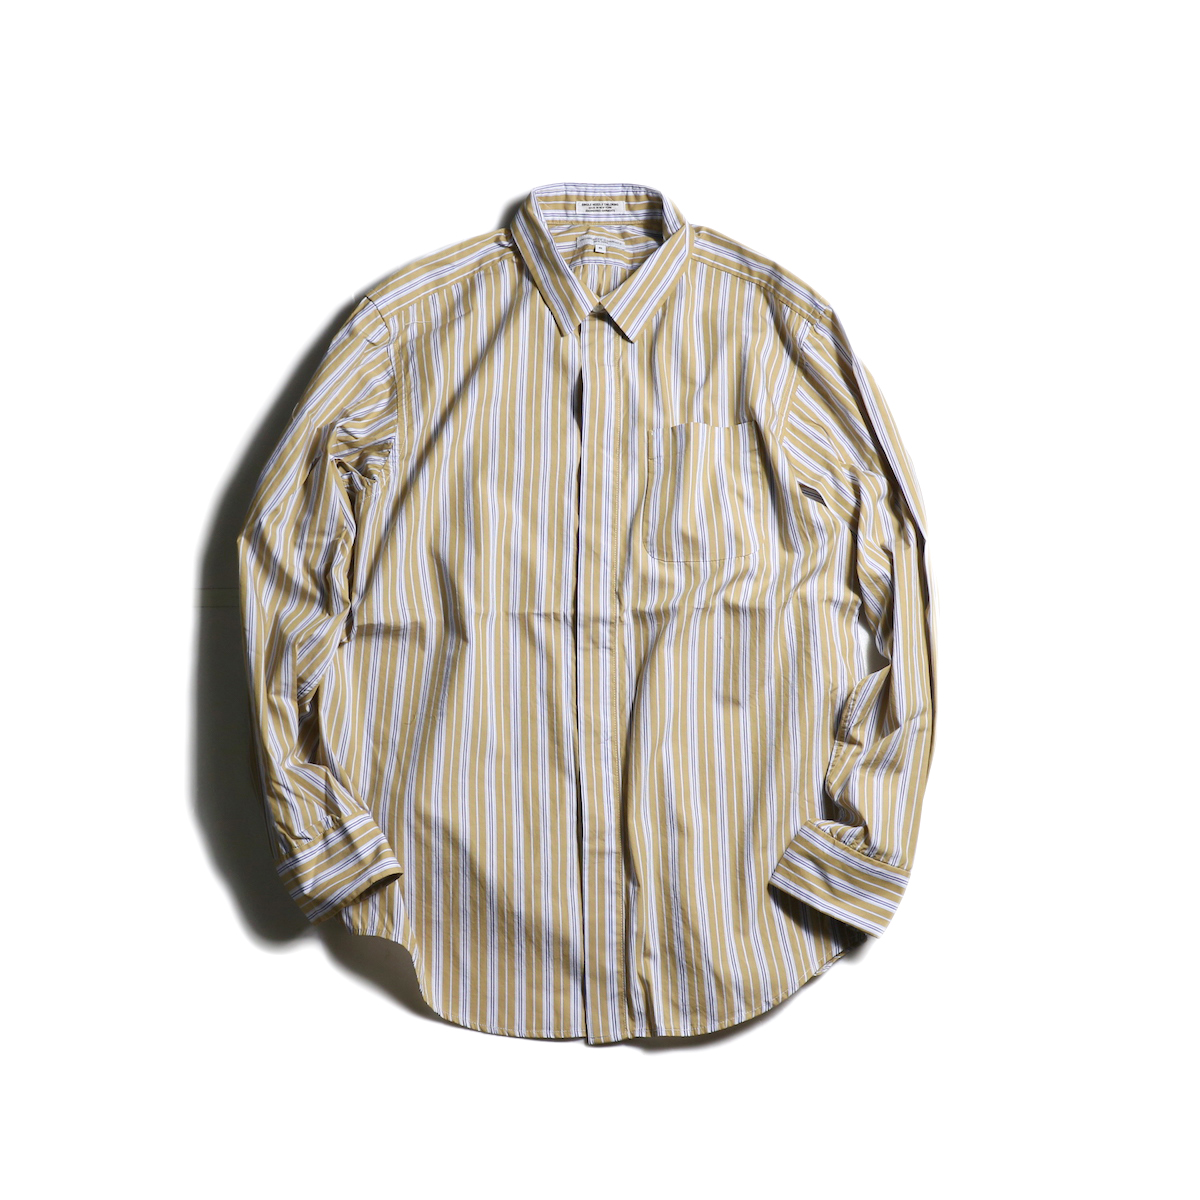 Engineered Garments / Short Collar Shirt -Multi St. Broadcloth (Tan)